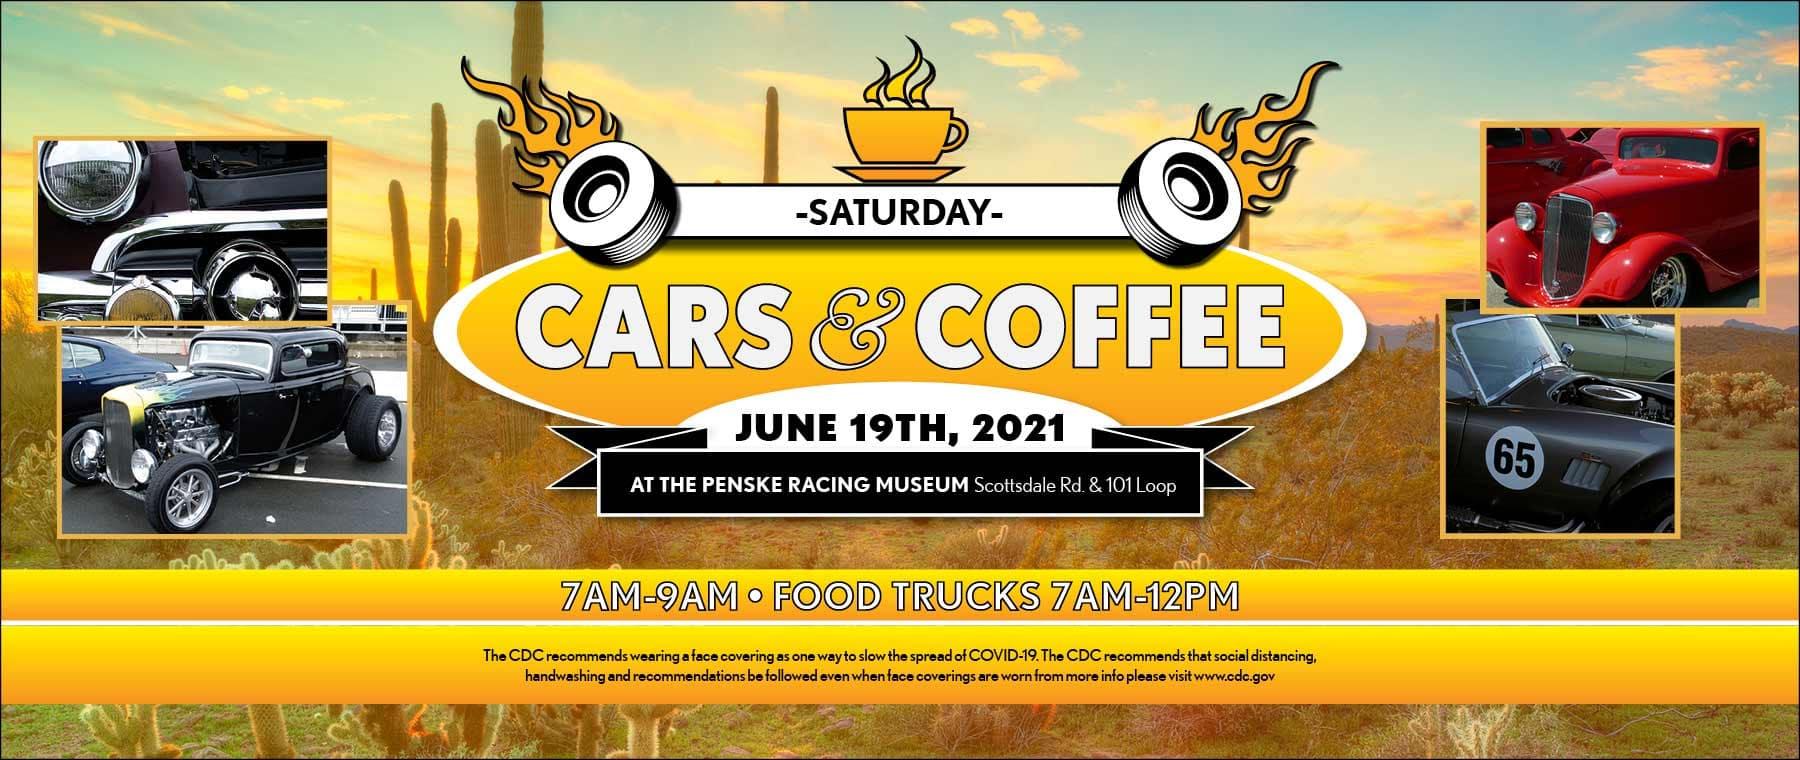 Cars & Coffee - Saturday, June 19, 2021